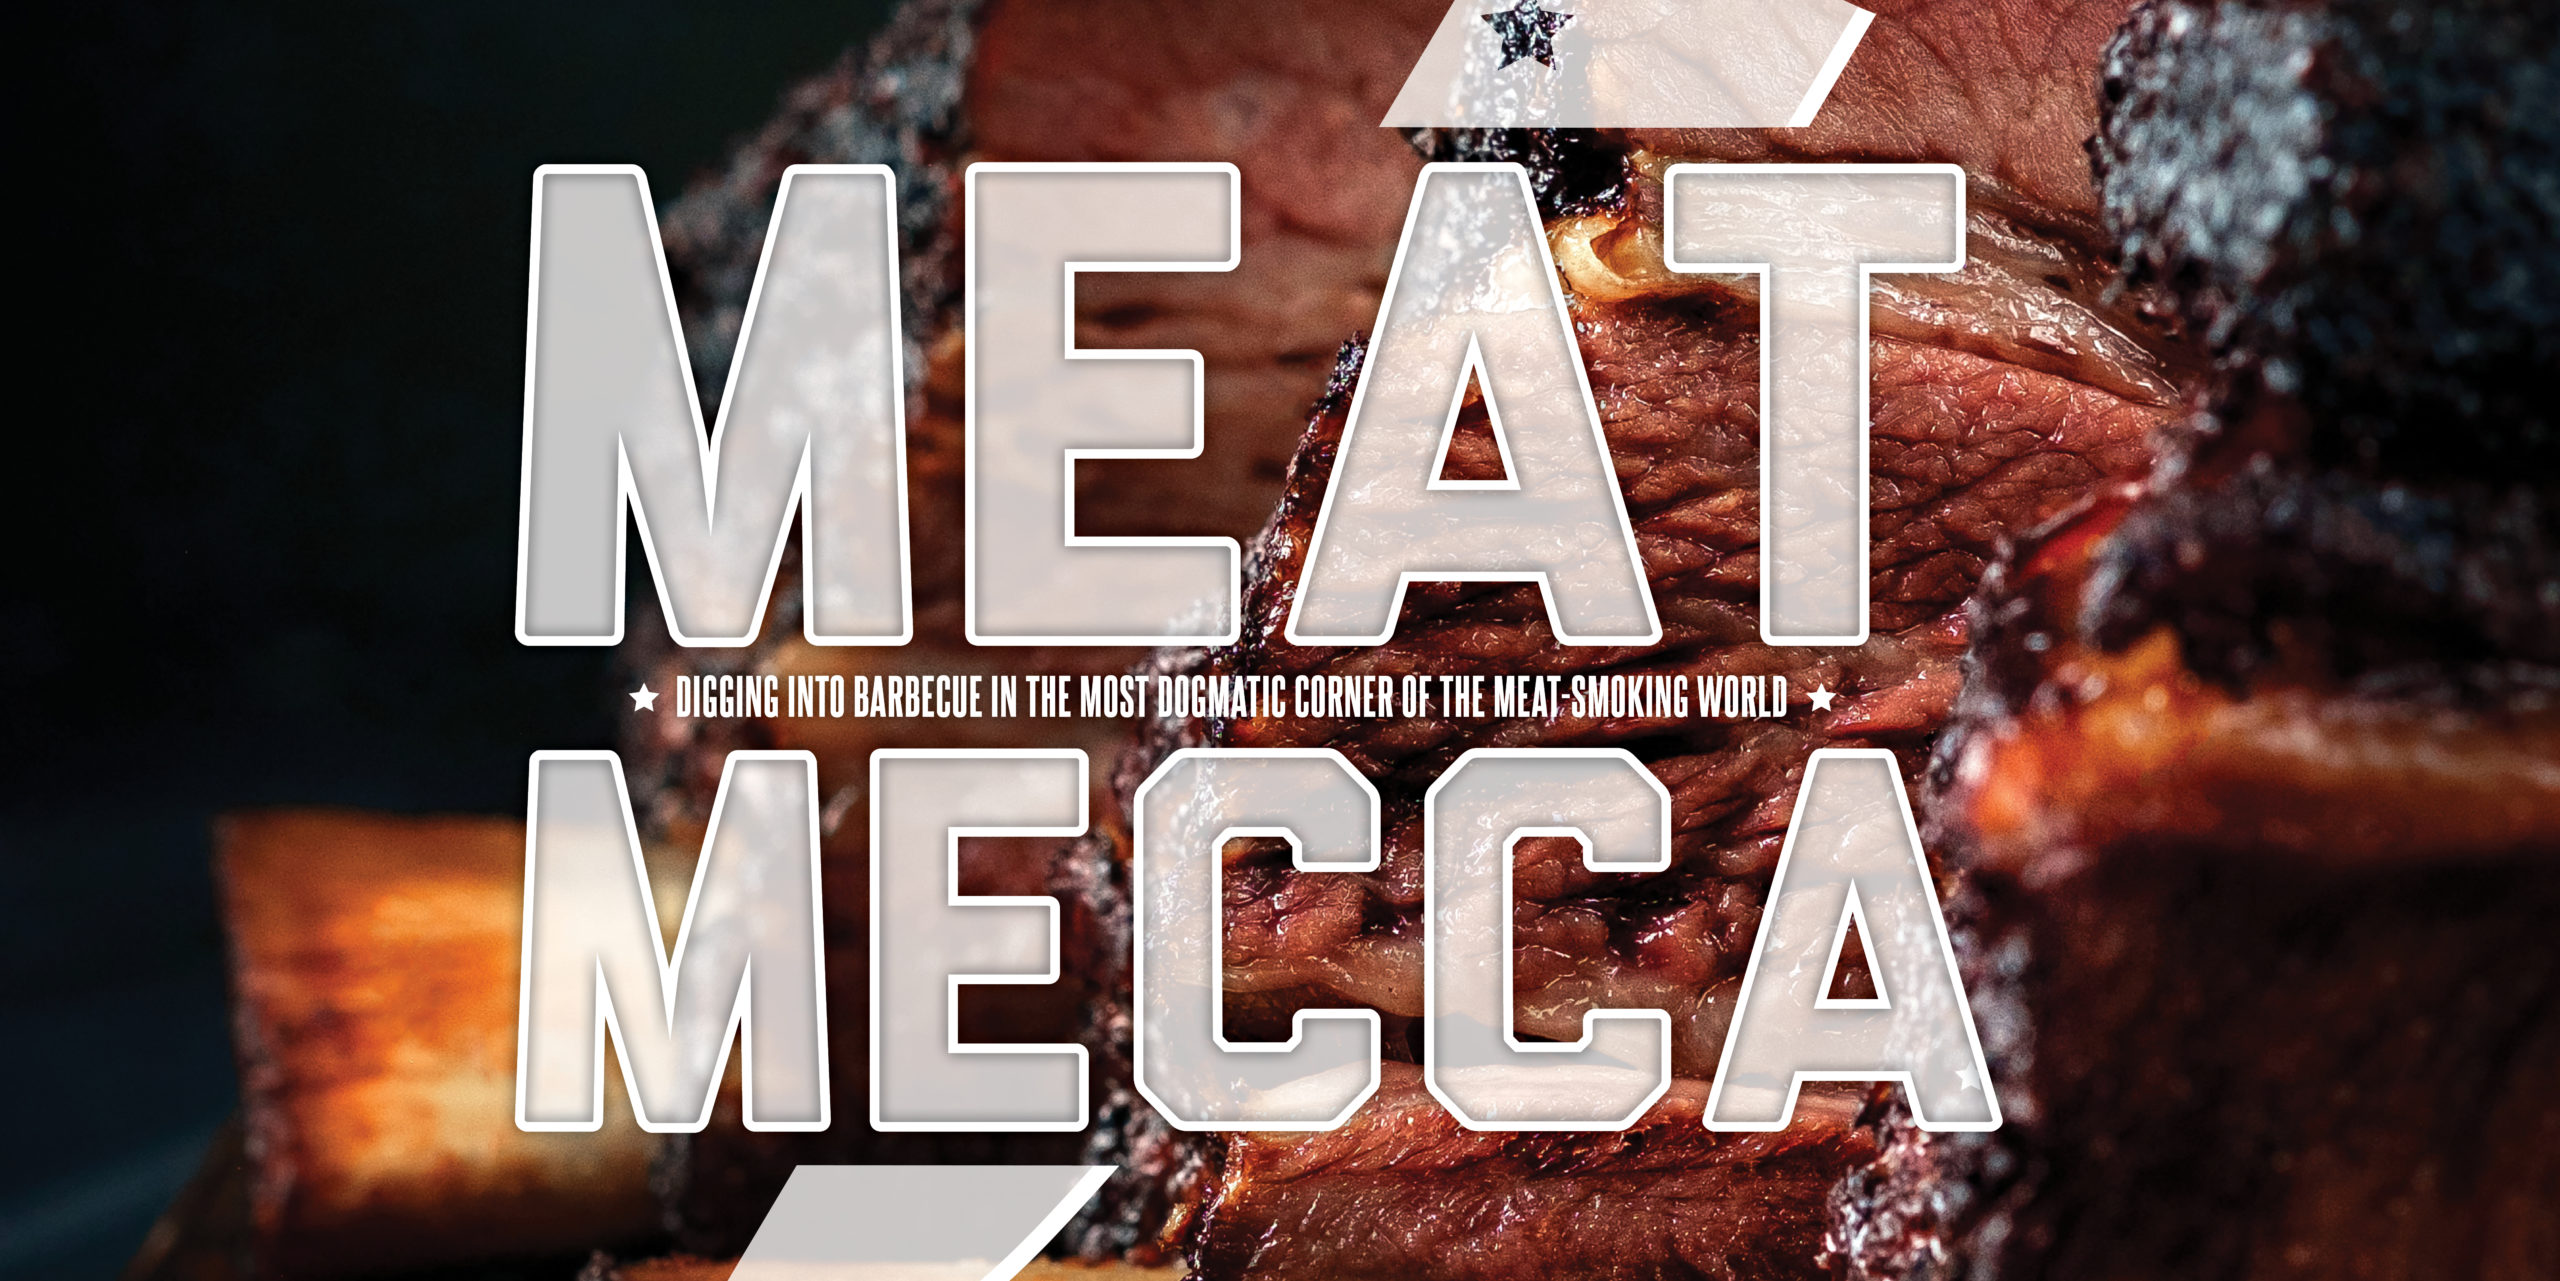 Meat Mecca